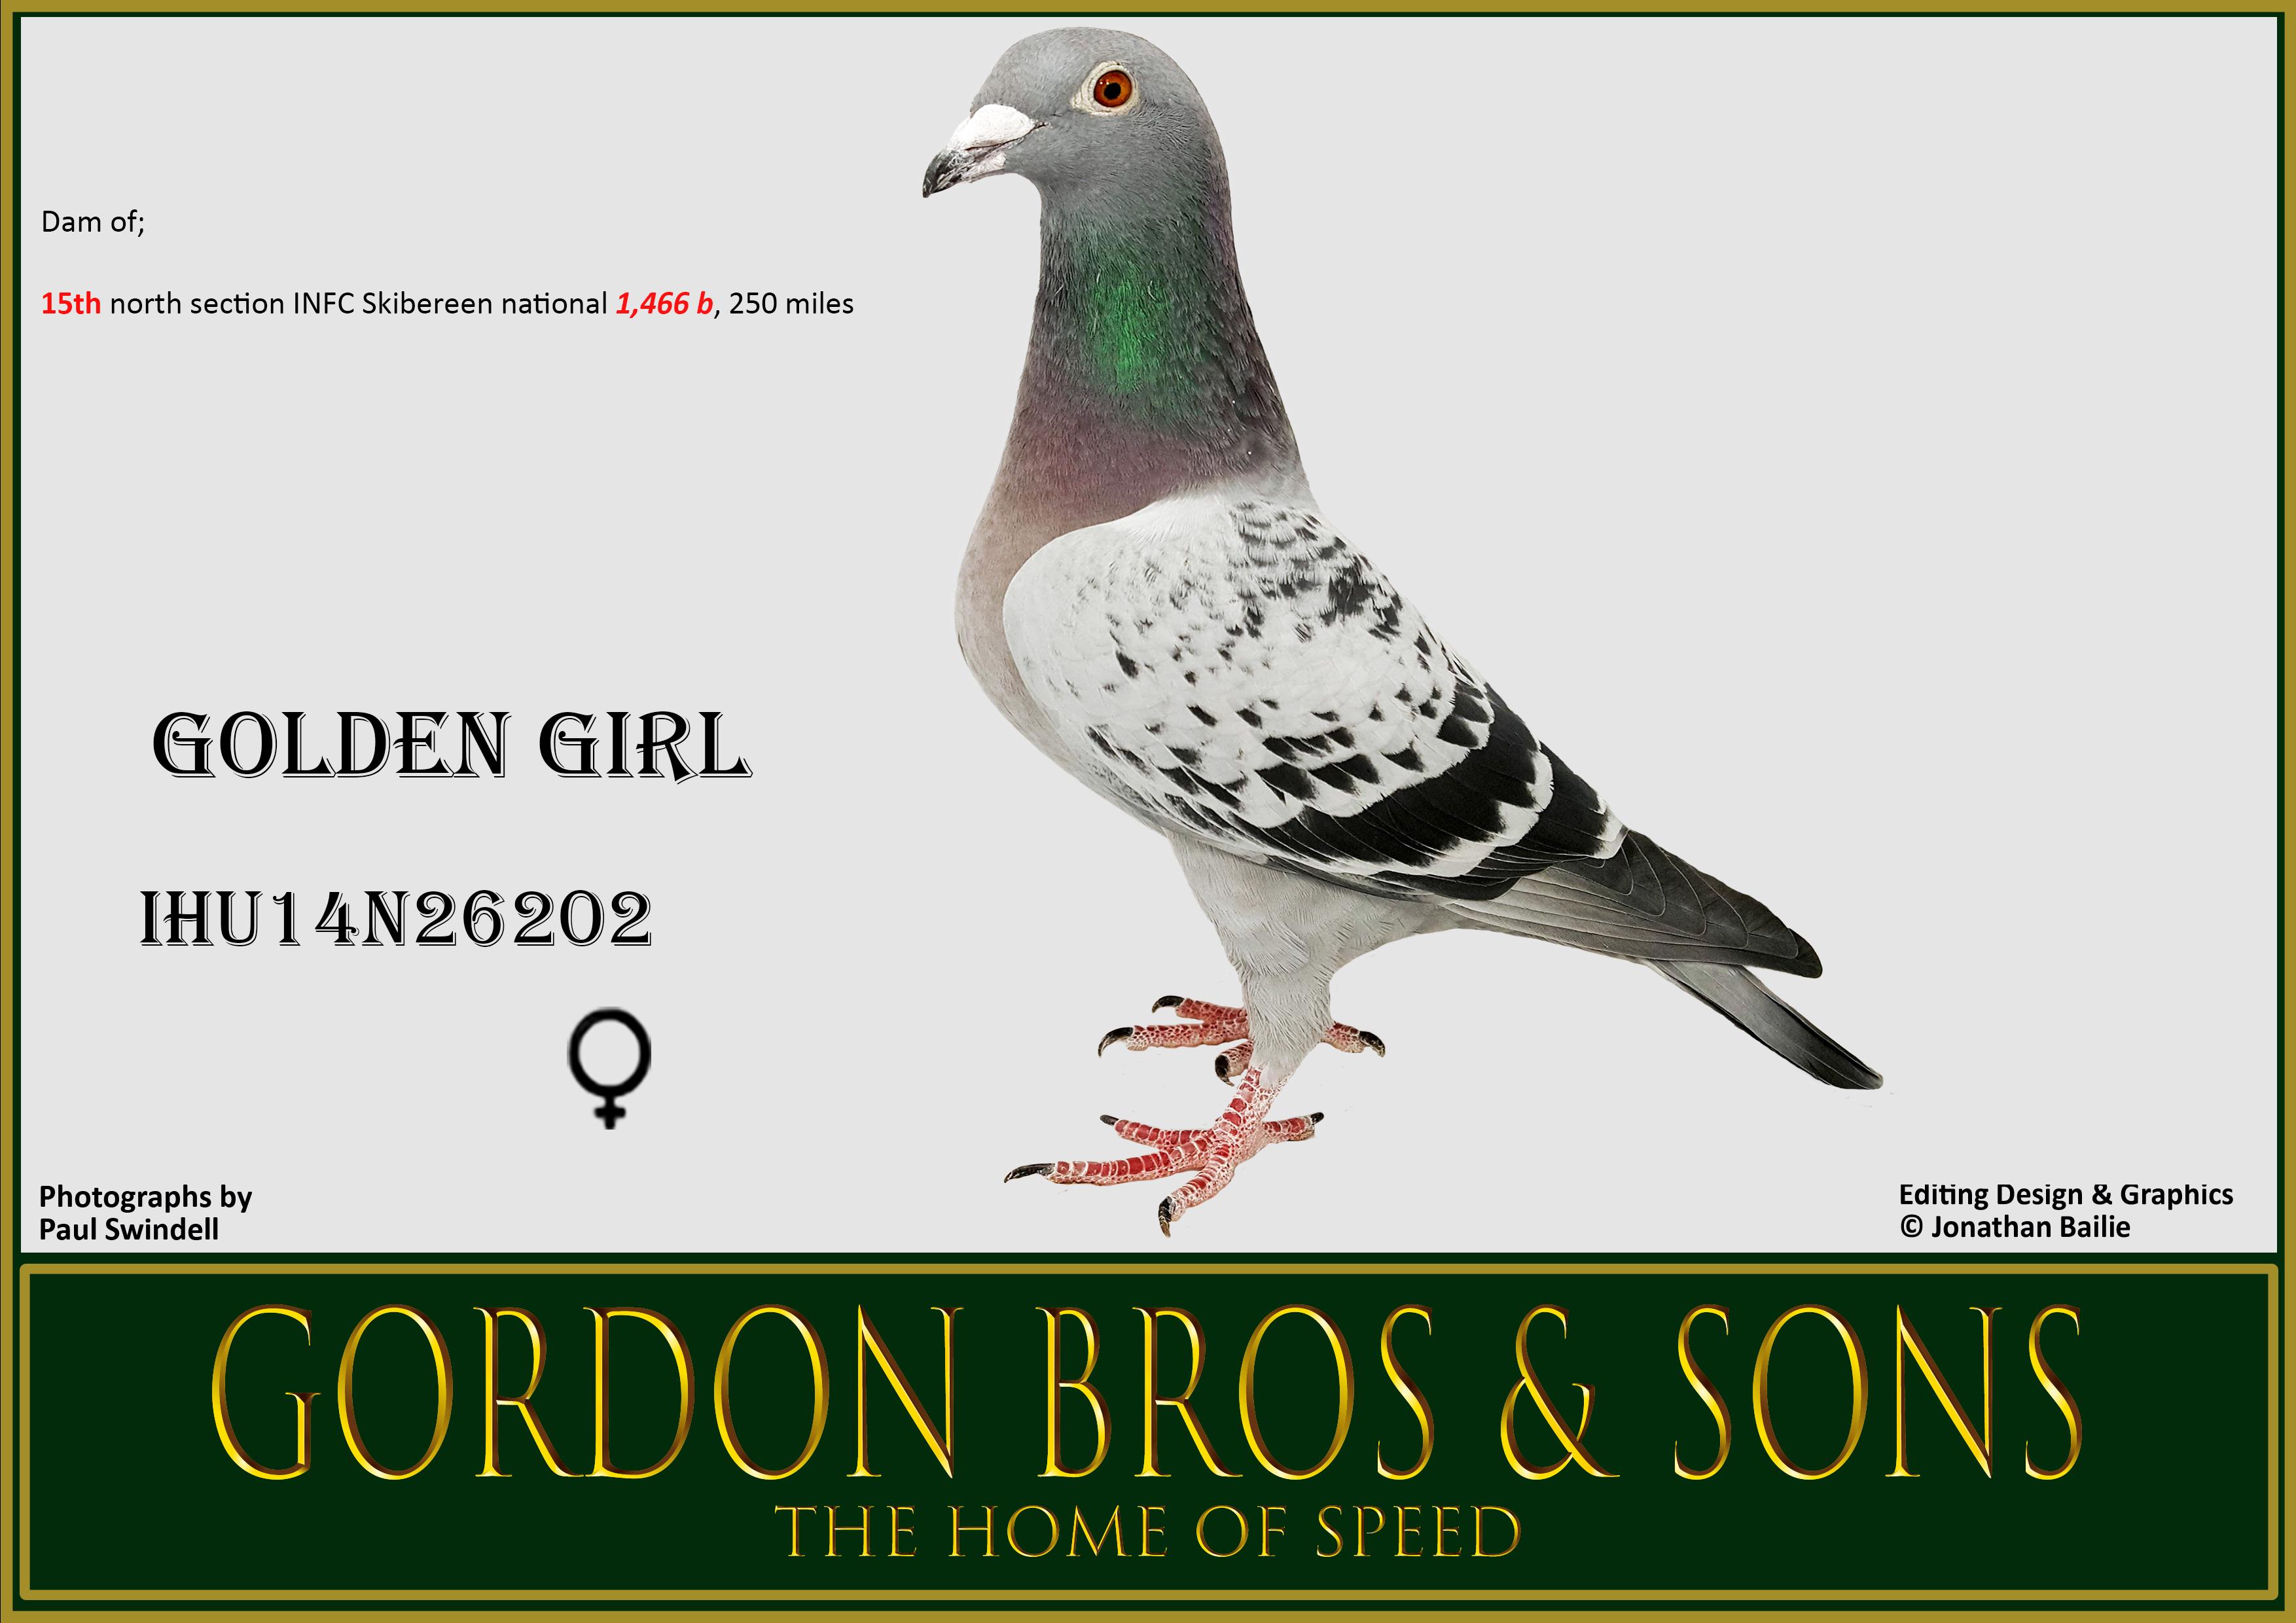 WO IHU14N26202 GOLDEN GIRL Gordon Bros